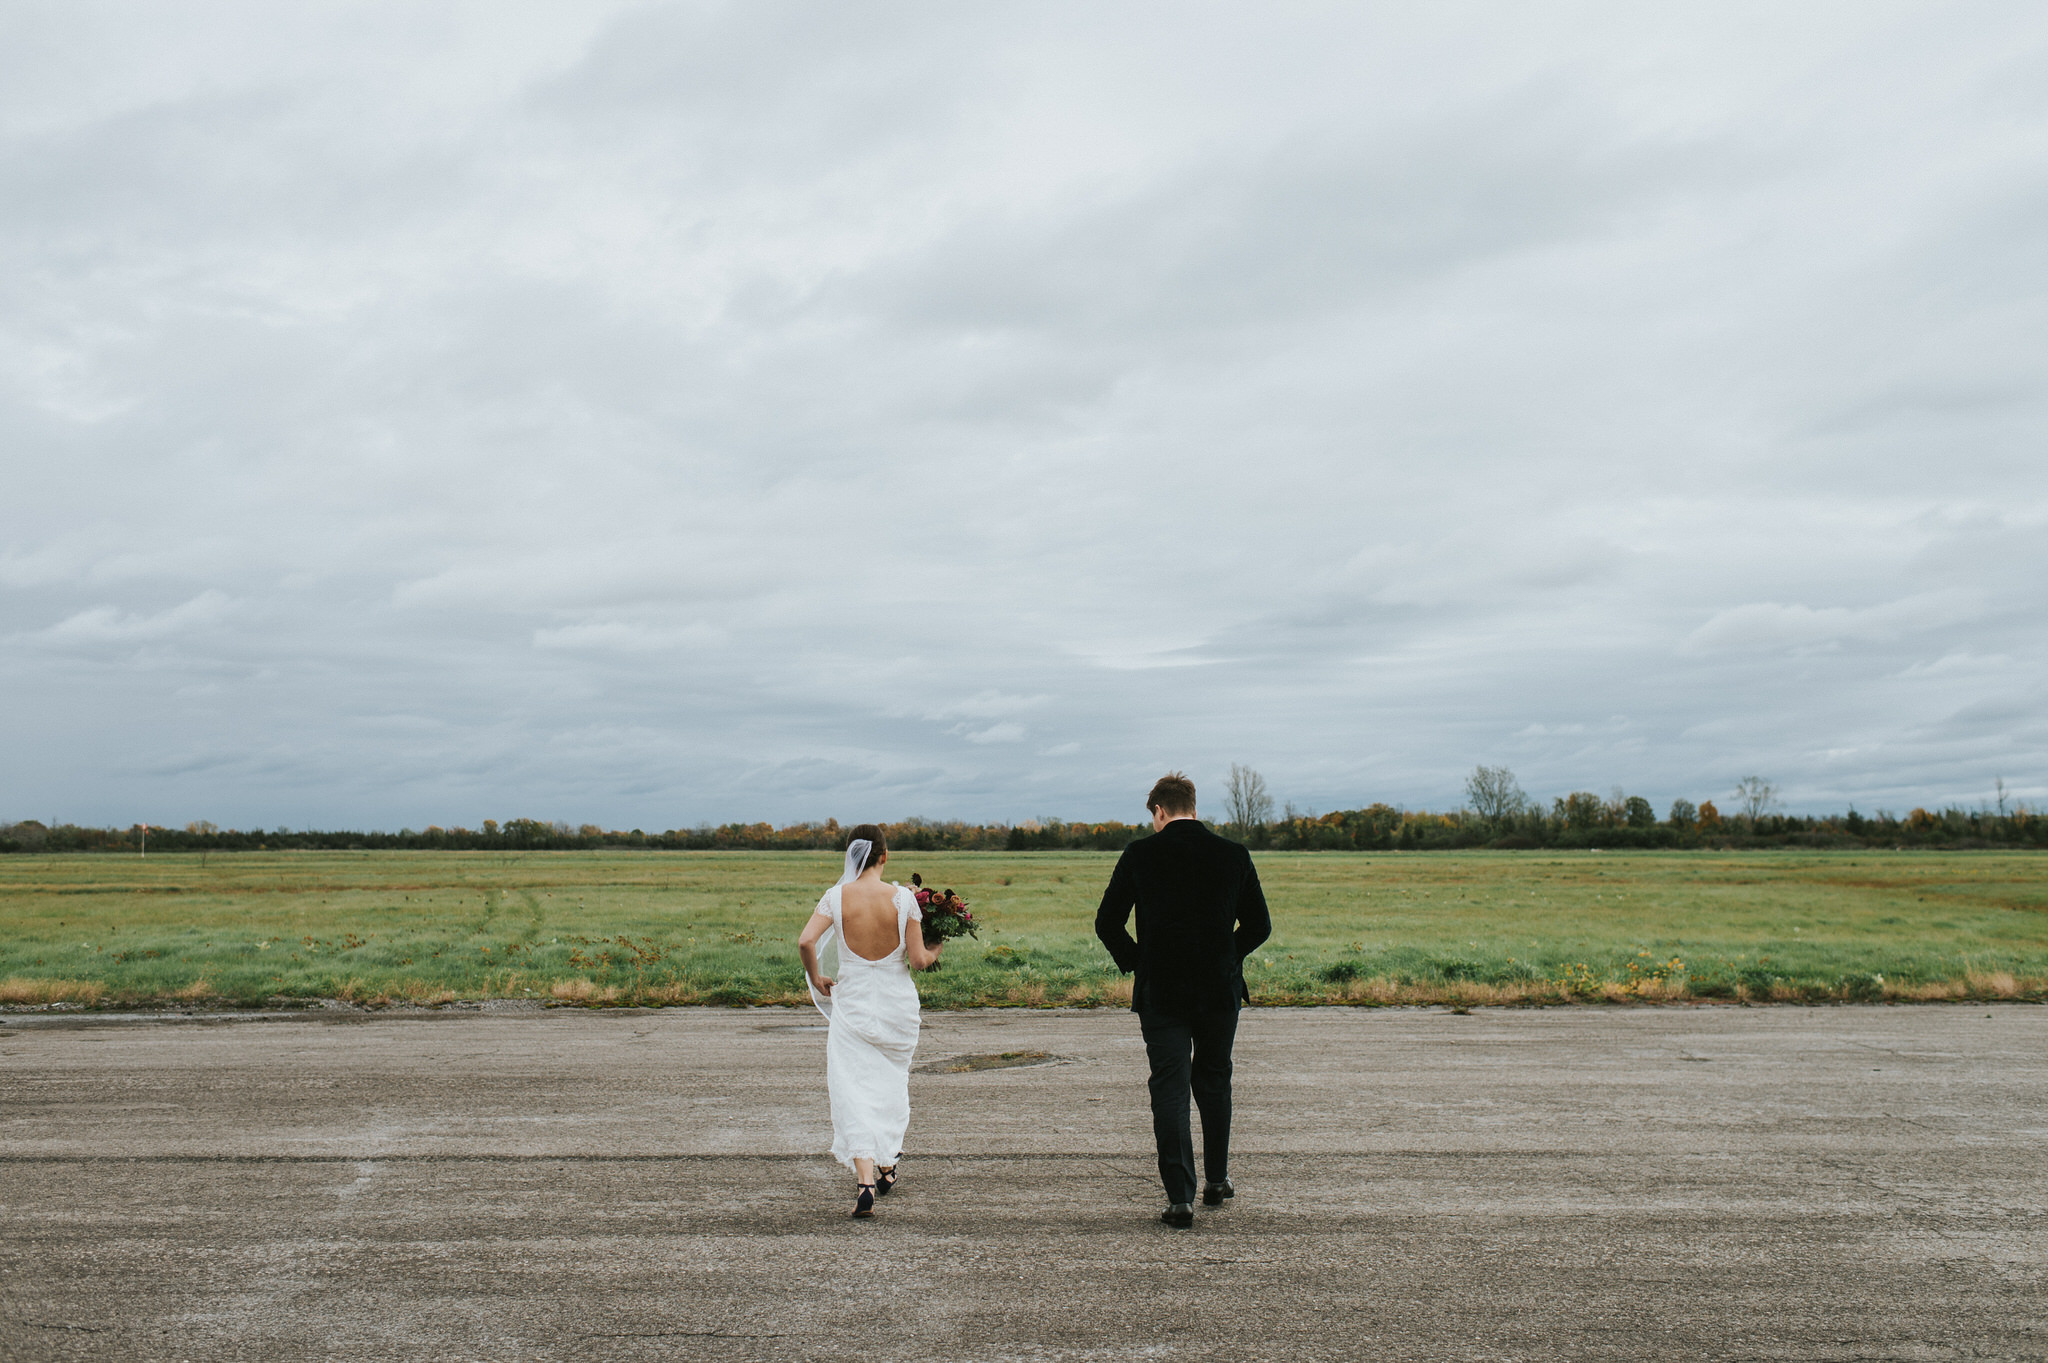 scarletoneillphotography_weddingphotography_prince edward county weddings056.JPG